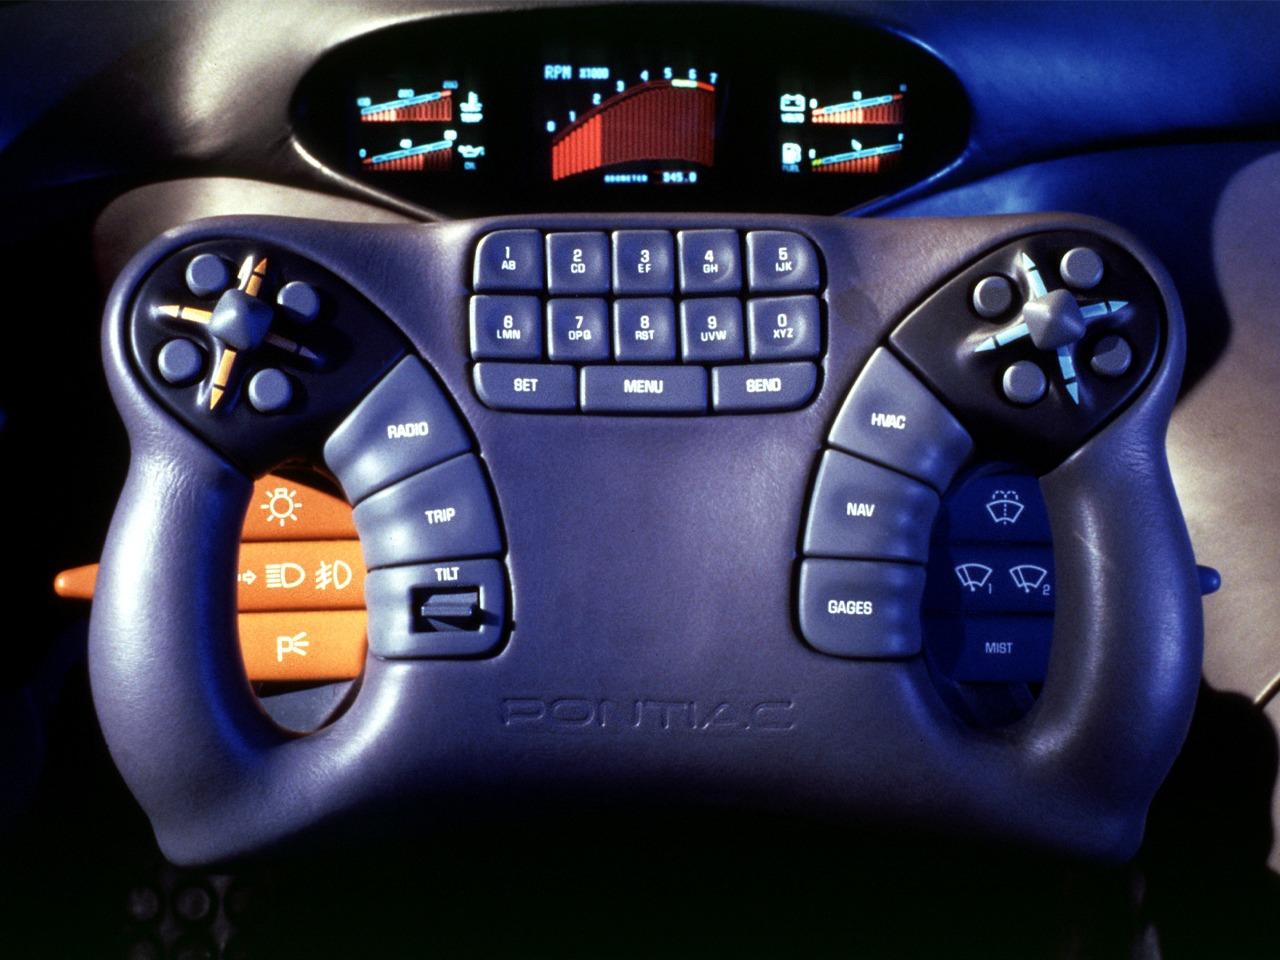 Auto Care Near Me >> Pontiac Pursuit Concept (1987) - Old Concept Cars